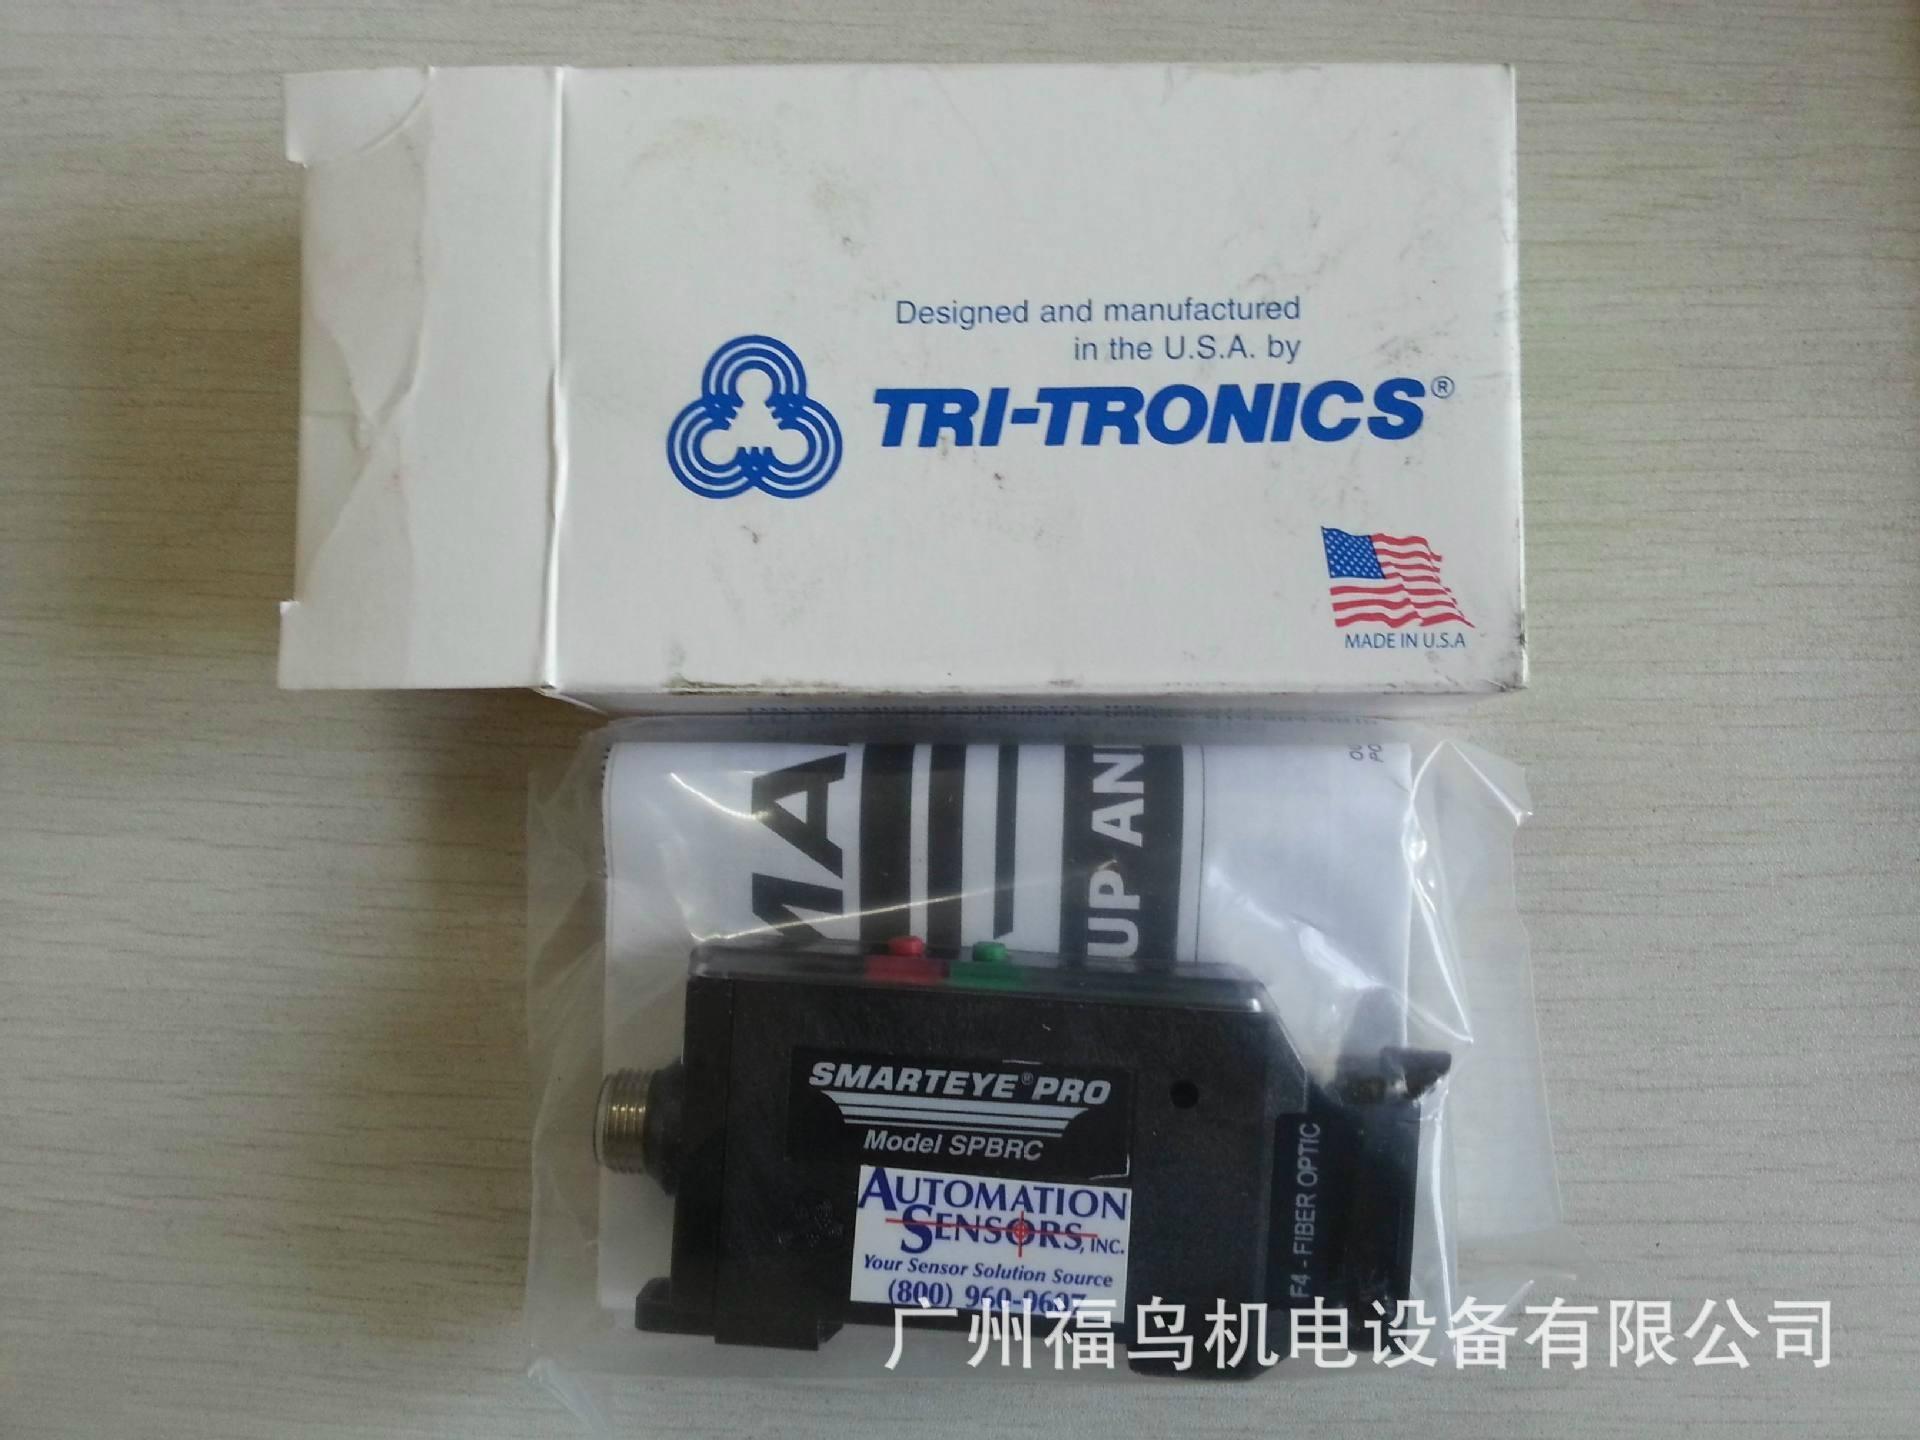 TRI-TRONICS放大器, 傳感器, 型號: SPBRCF4